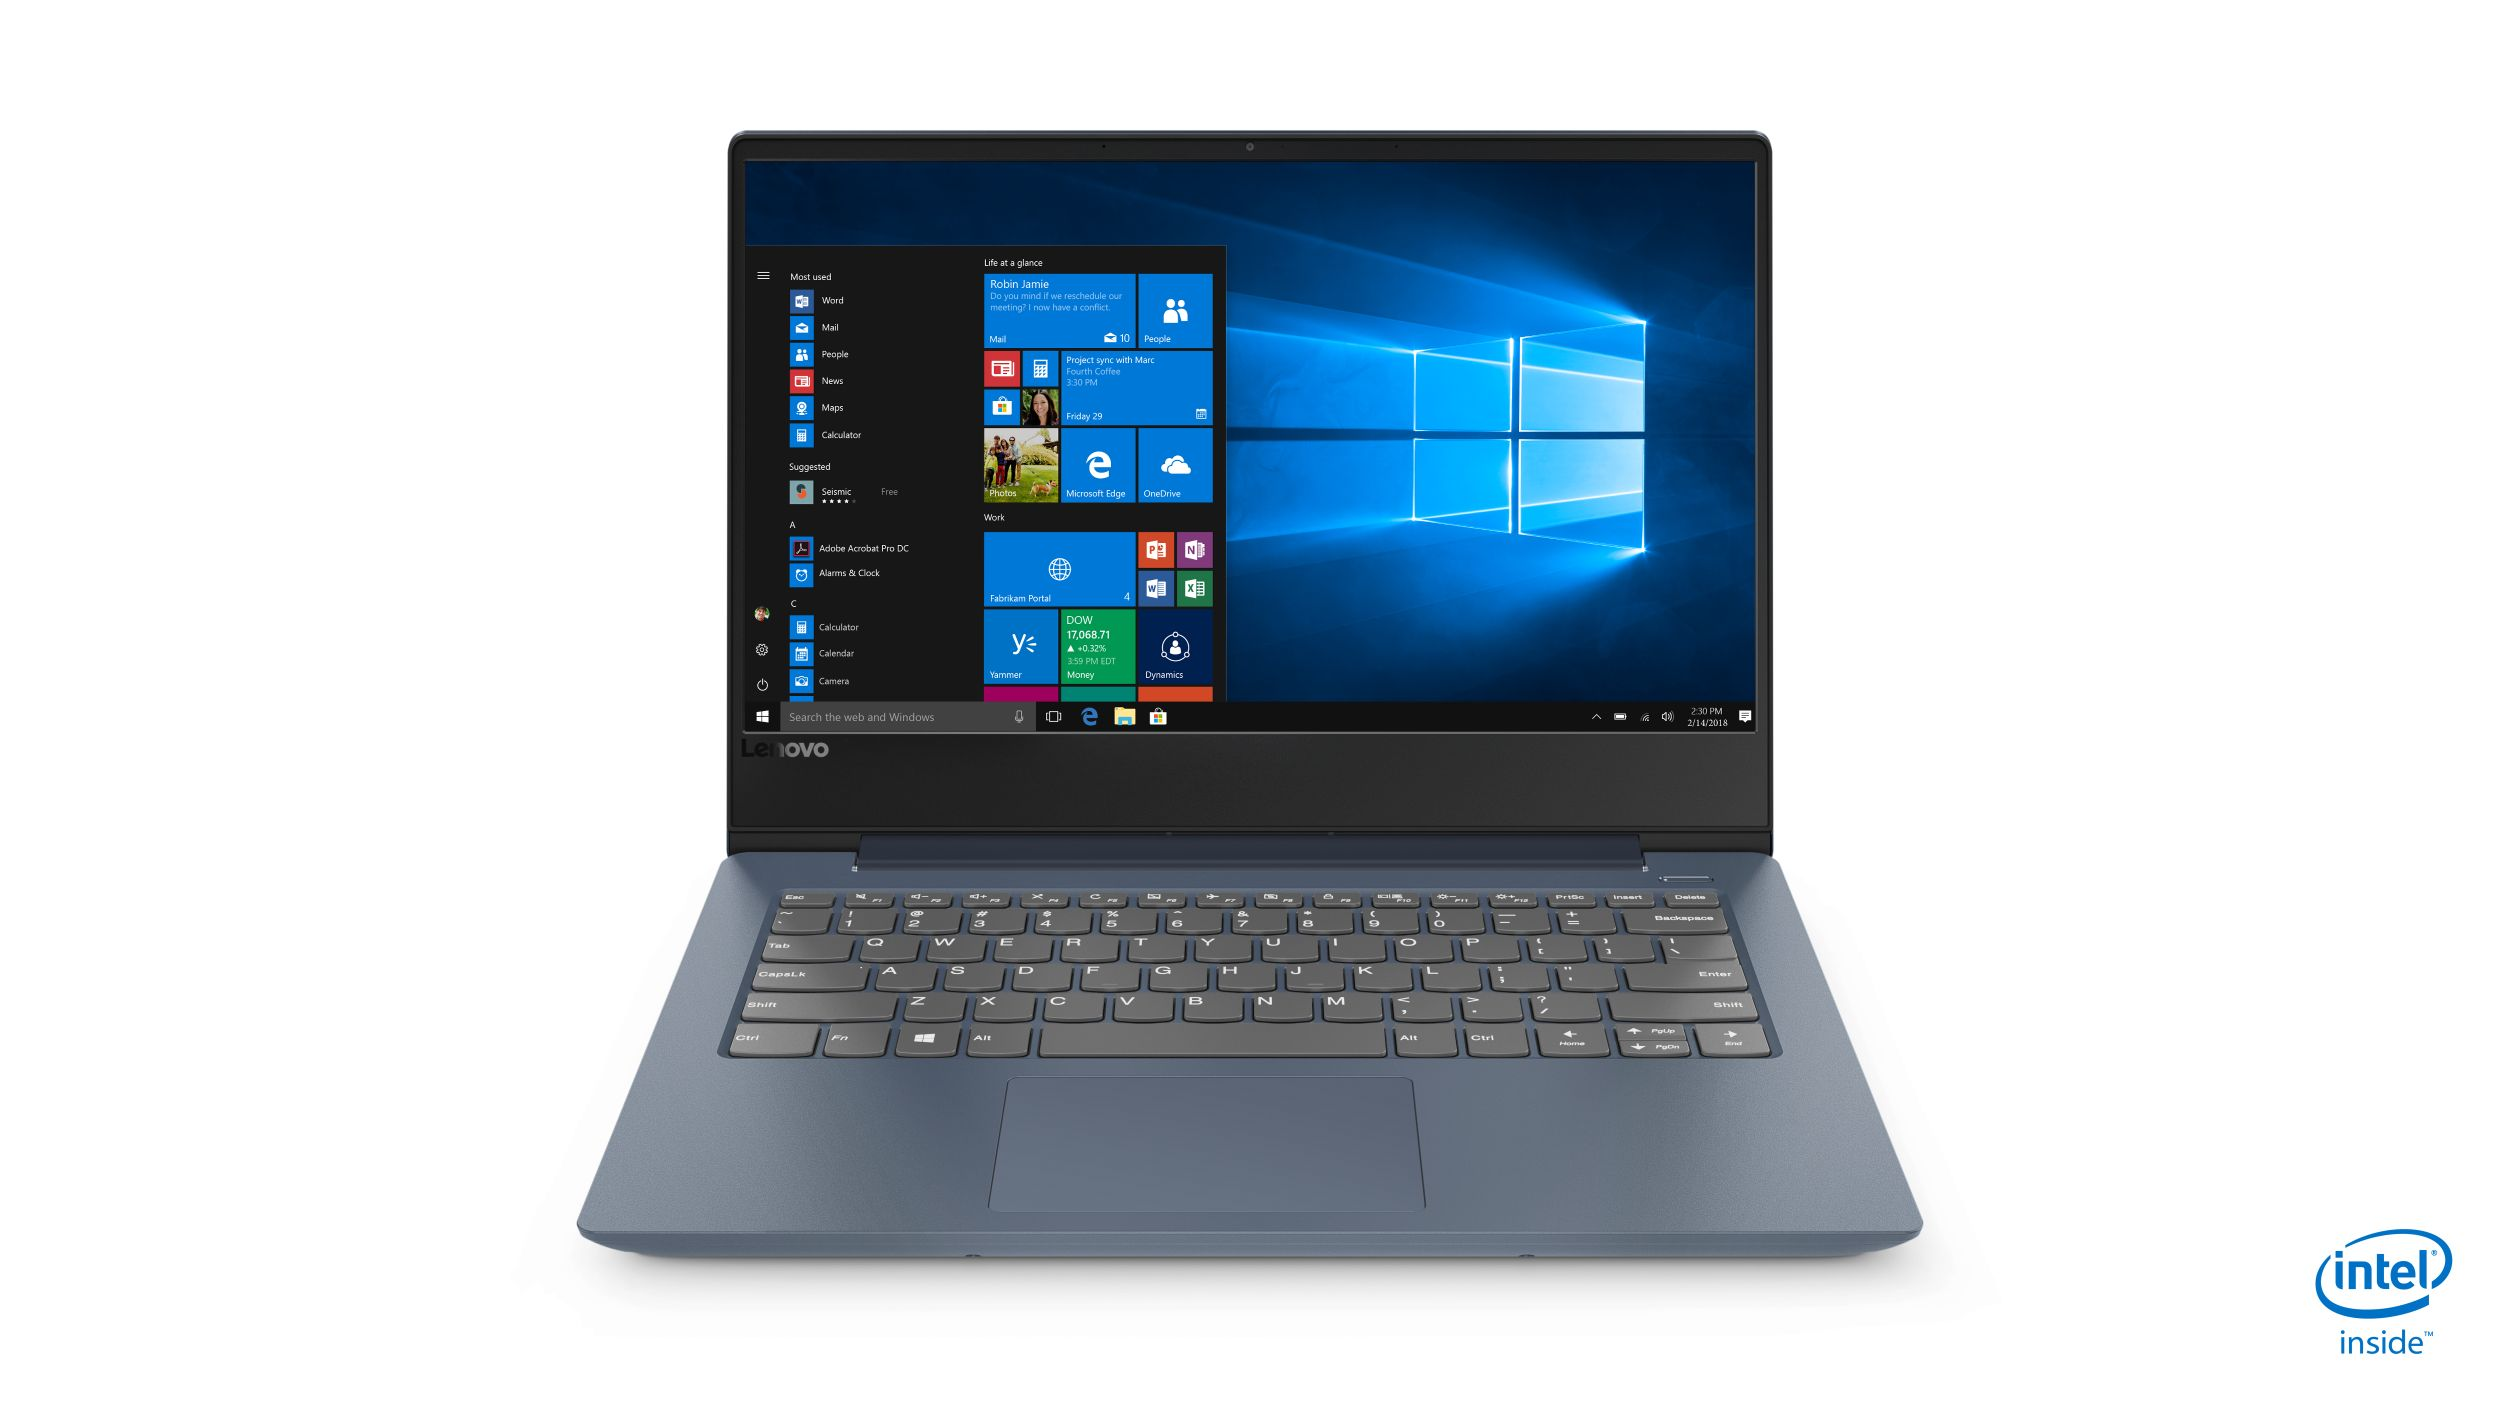 "Lenovo IdeaPad 330S-14IKB i7-8550U 4,00GHz/8GB/SSD 128GB+HDD 1TB/14"" FHD/IPS/AG/Radeon 2GB/WIN10 modrá 81F4004QCK"